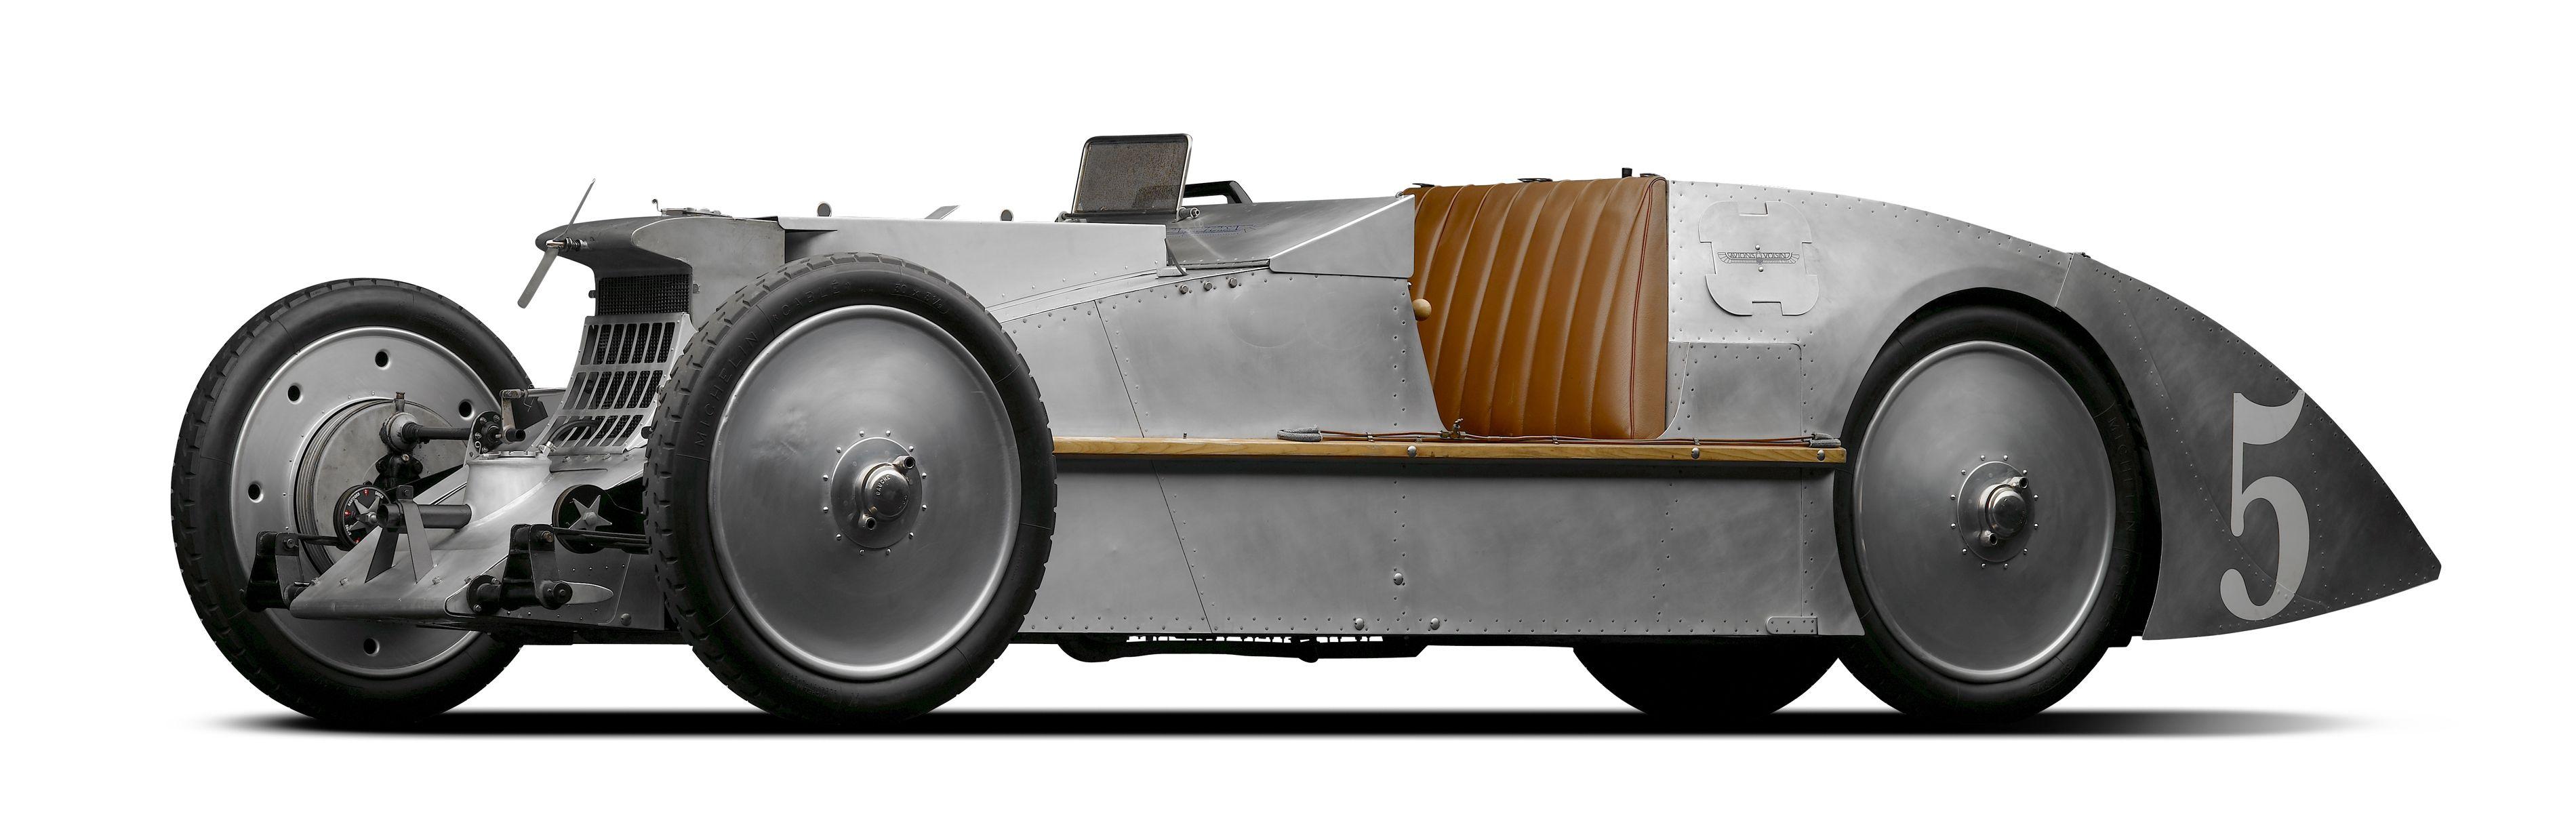 Voisin's C6 Laboratoire was an imaginative approach to creation of a Grand Prix car utilizing Voisin's knowledge of aircraft design. (Picture courtesy auto100.com).